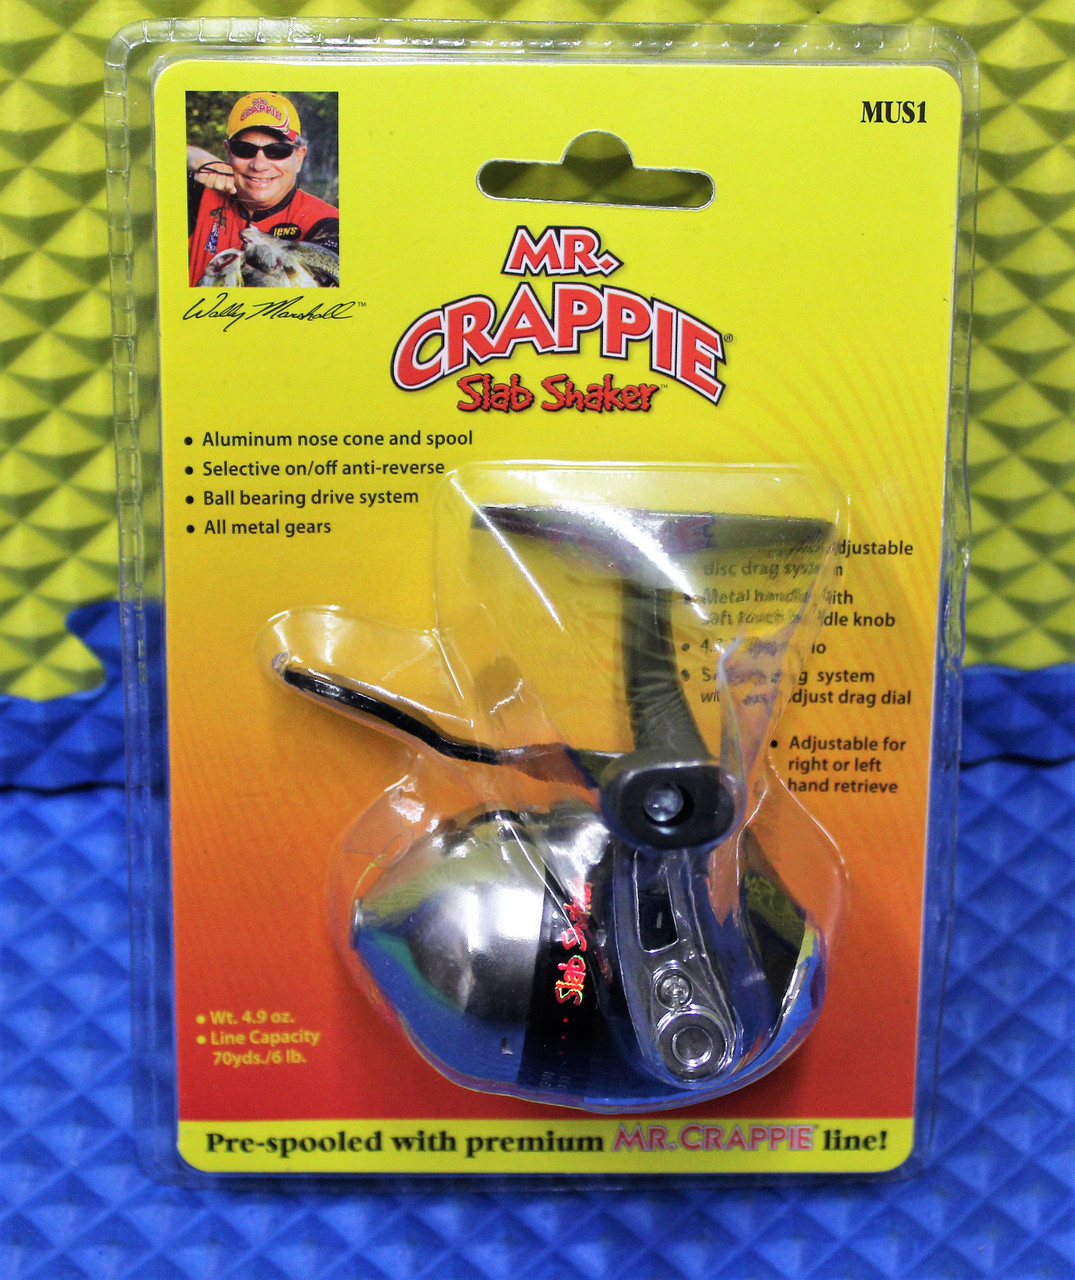 Mr. Crappie Slab Shaker UnderSpin Crappie Reel Pre-spooled With Premium Line MUS1